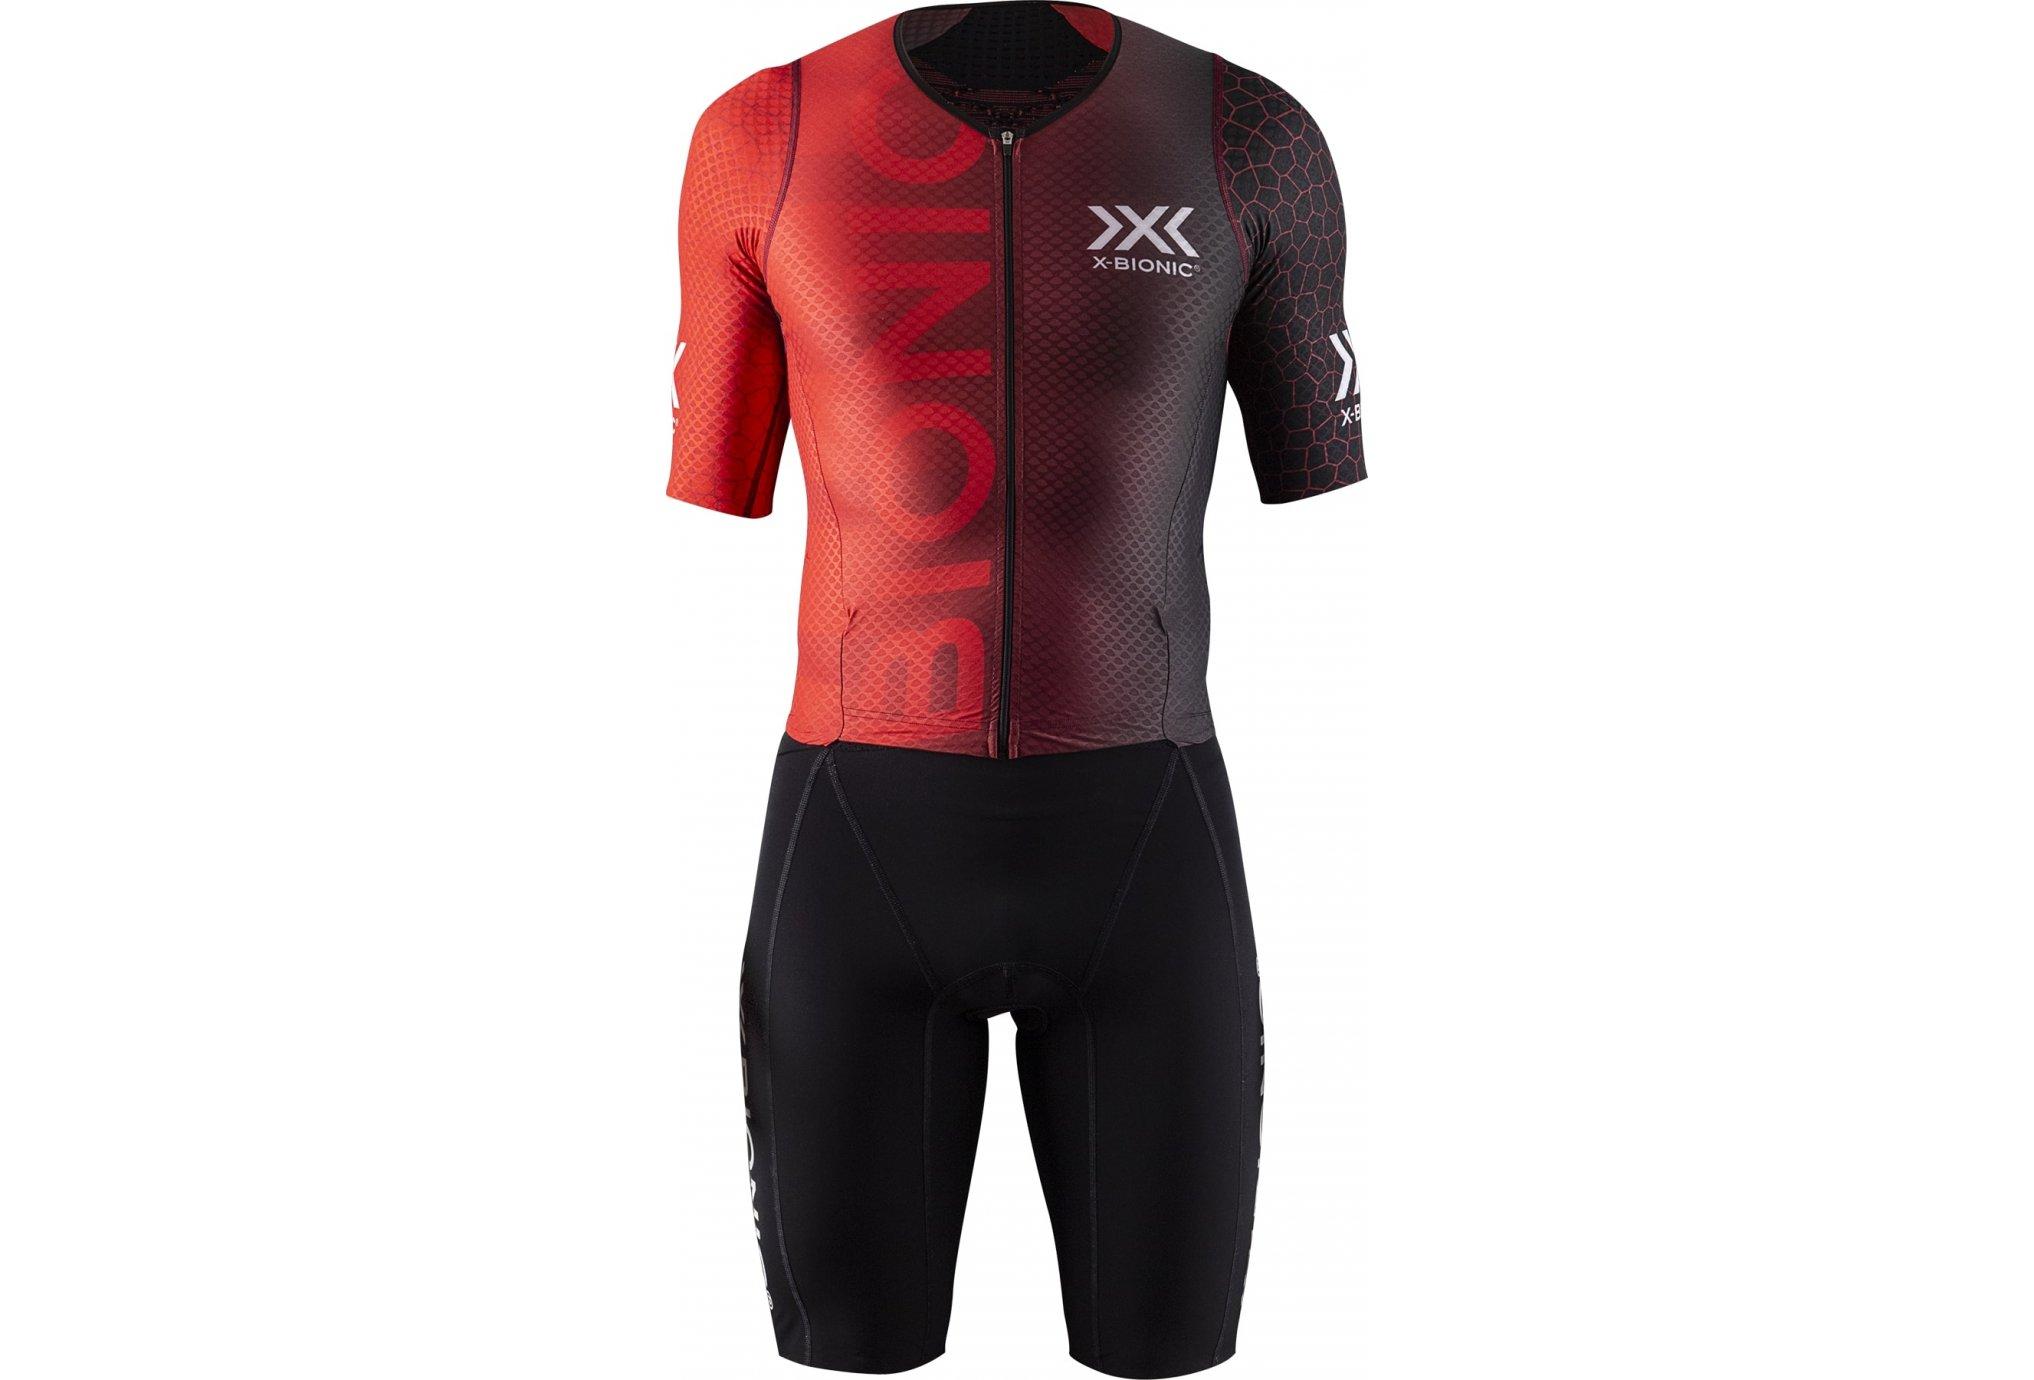 X-Bionic Dragonfly Trisuit 5G M vêtement running homme